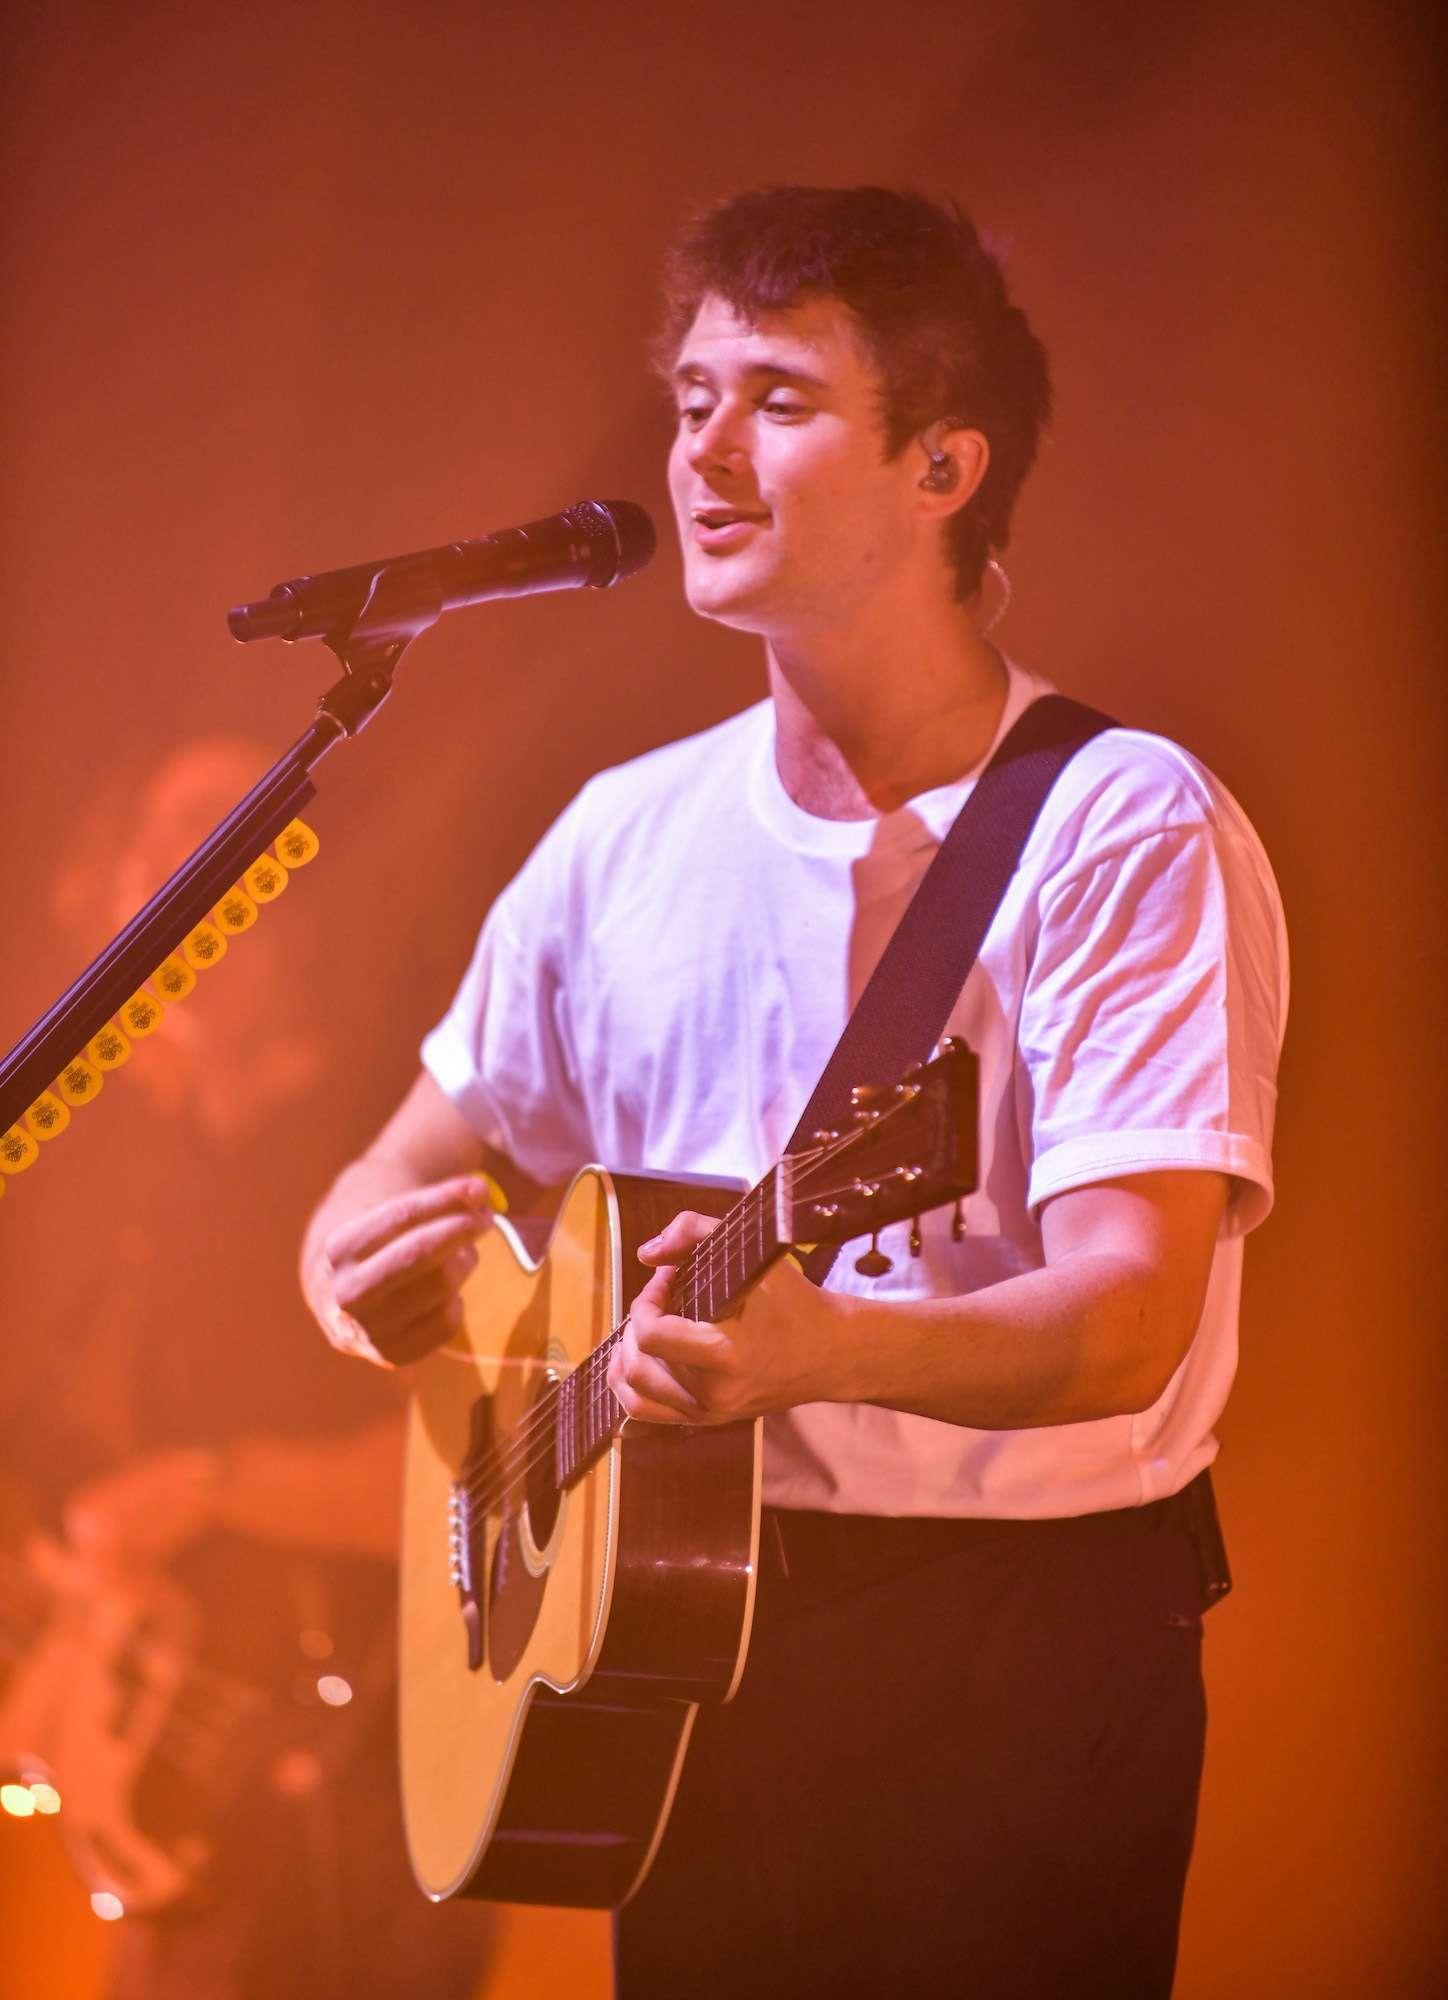 Alec Benjamin Live at Riviera [GALLERY] 18